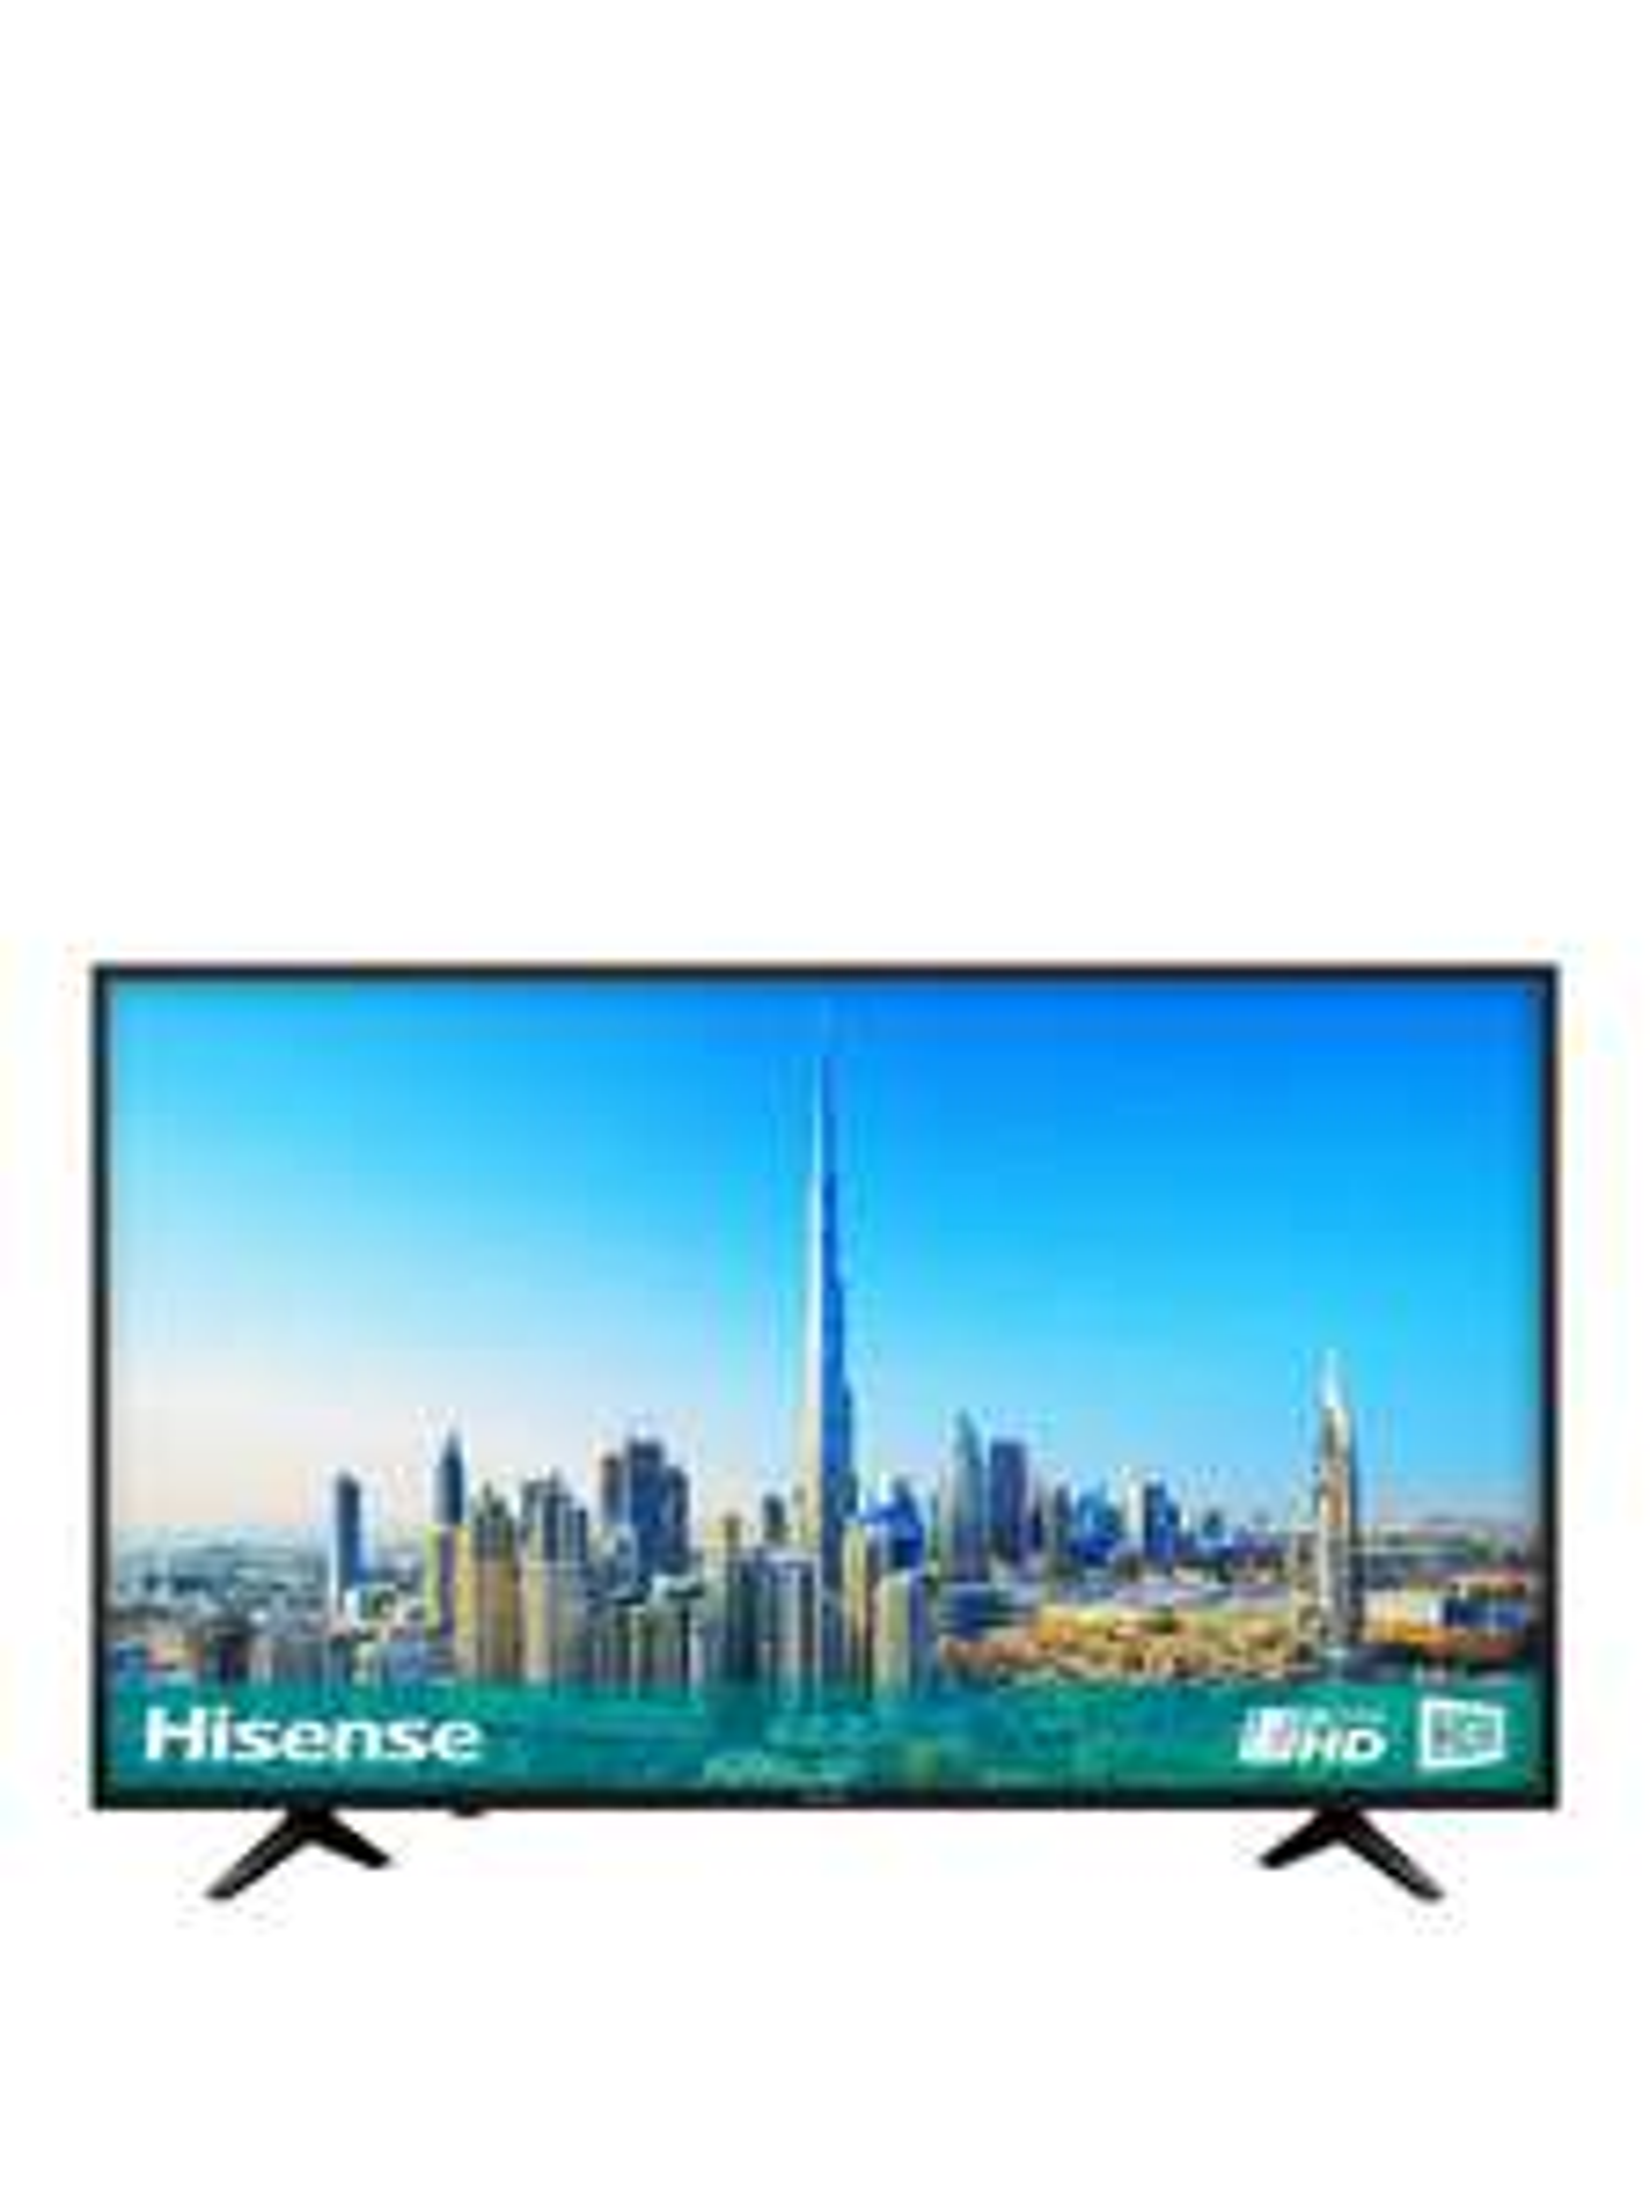 Hisense H65A6200UK 65 inch, 4K Ultra HD, HDR, Smart TV - £549 using £80 off code @ Very